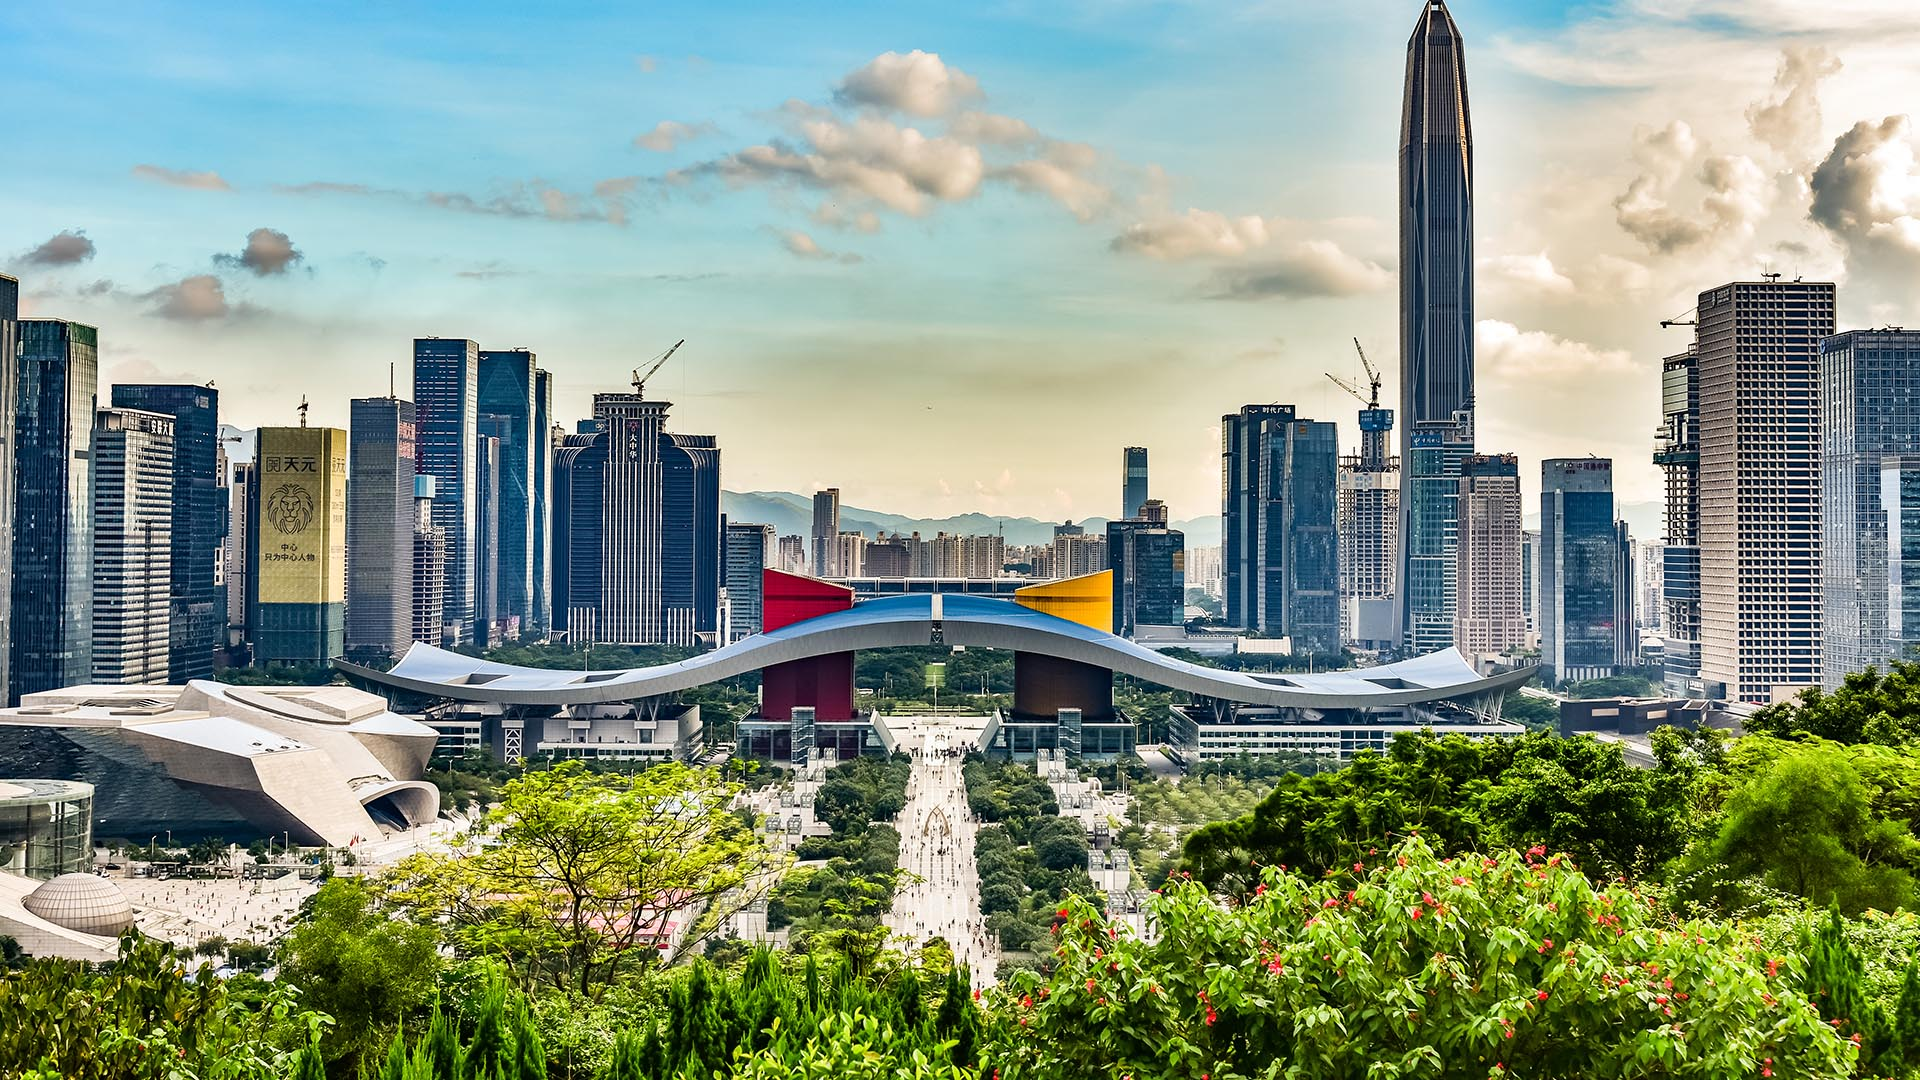 Sostenibilità a Shenzhen è la parola d'ordine